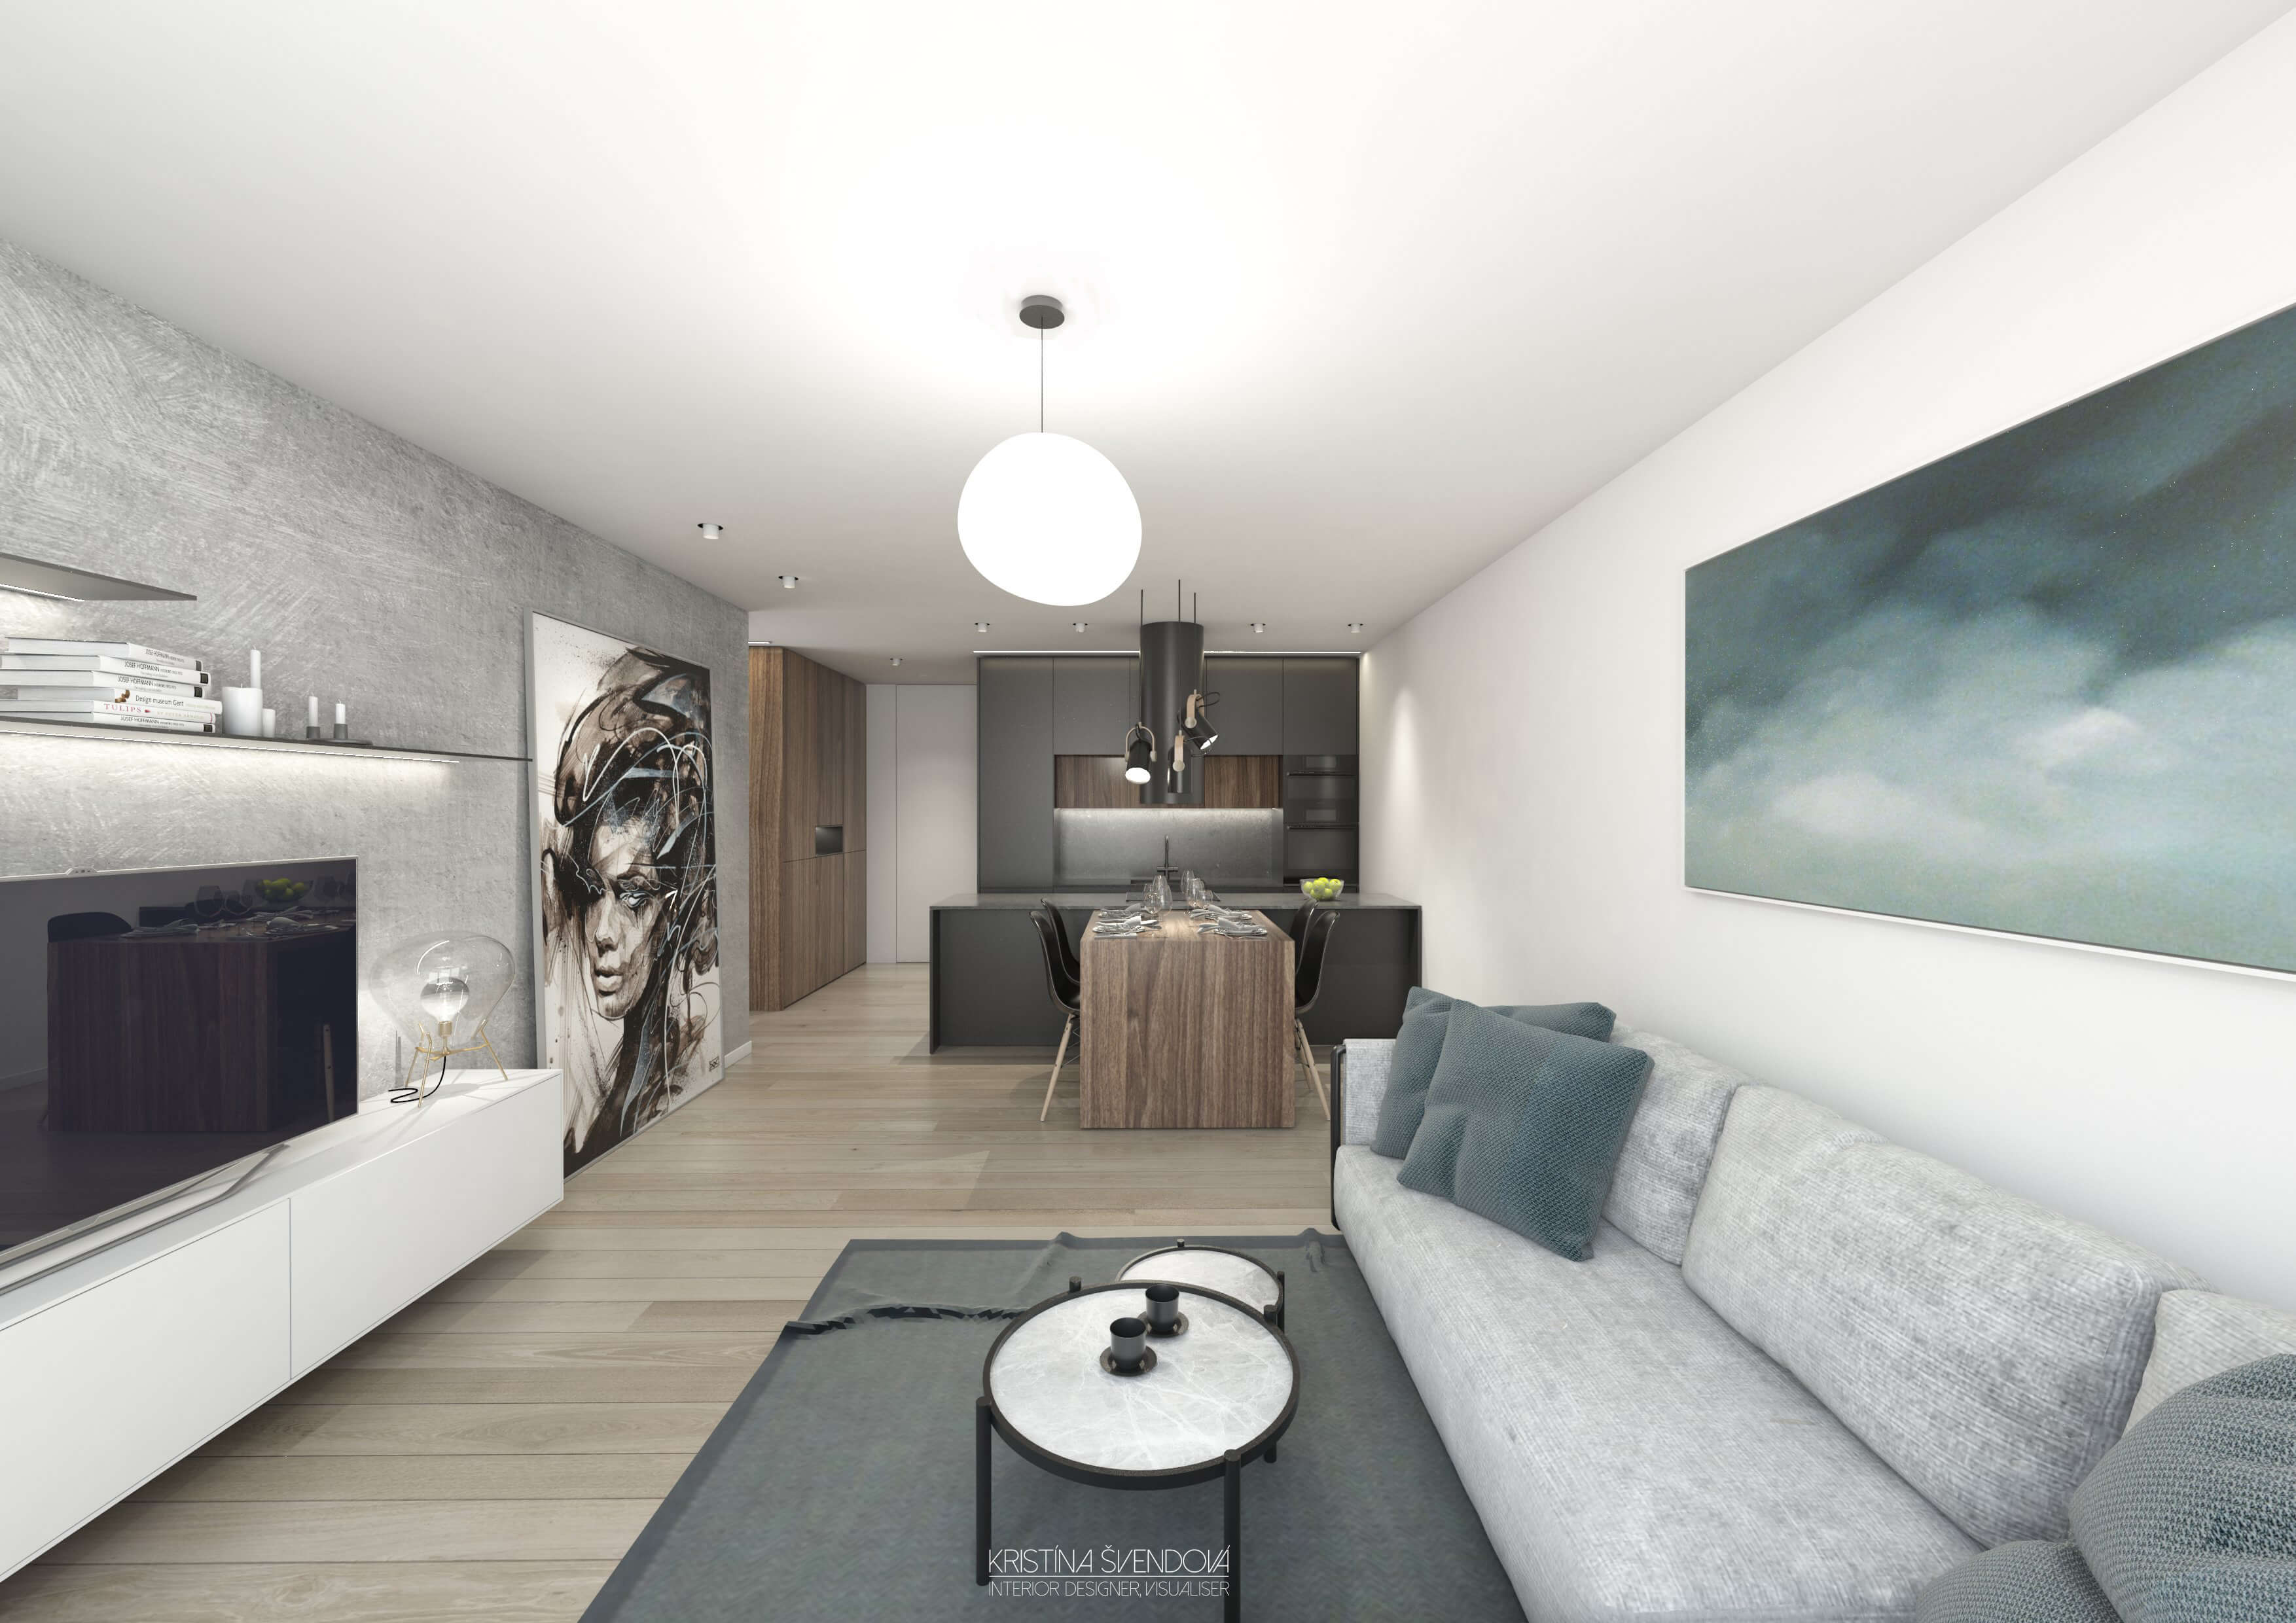 Predané: Exkluzívny 3- izbový byt v NOVOSTAVBE BA-NIVY, City Park, 71,24m2, balkón 8,5m2-1